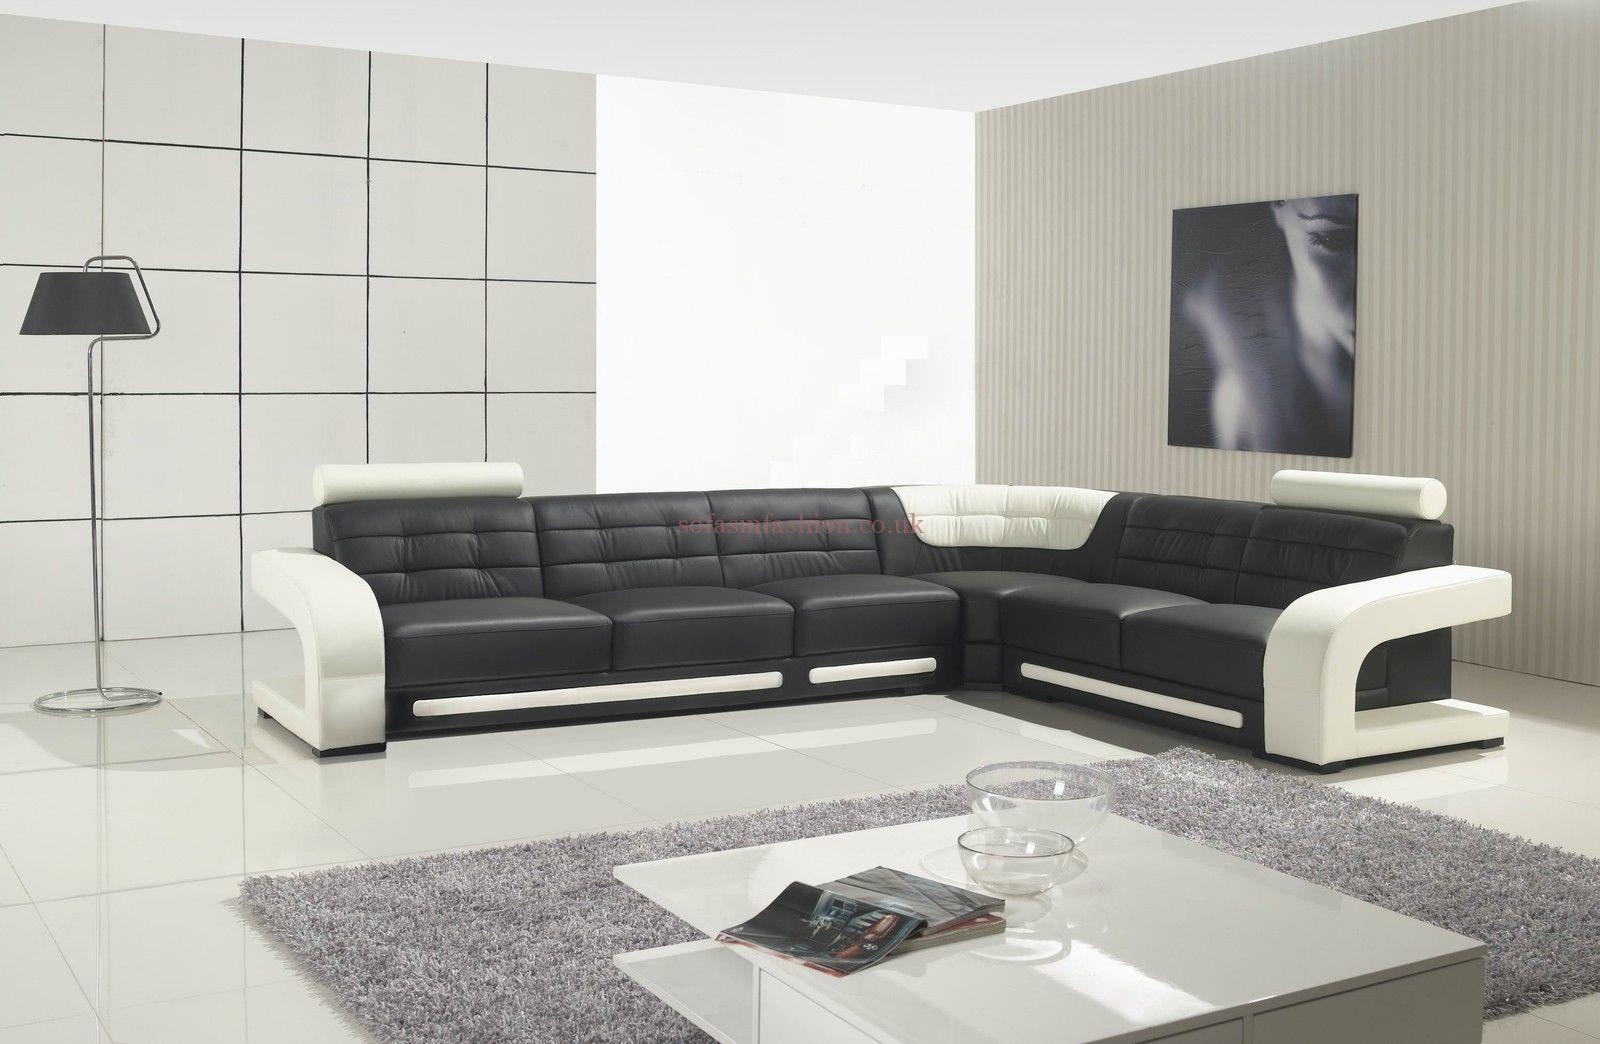 28 Leather Corner Sofas | Auto Auctions Pertaining To Leather Corner Sofas (Image 3 of 20)